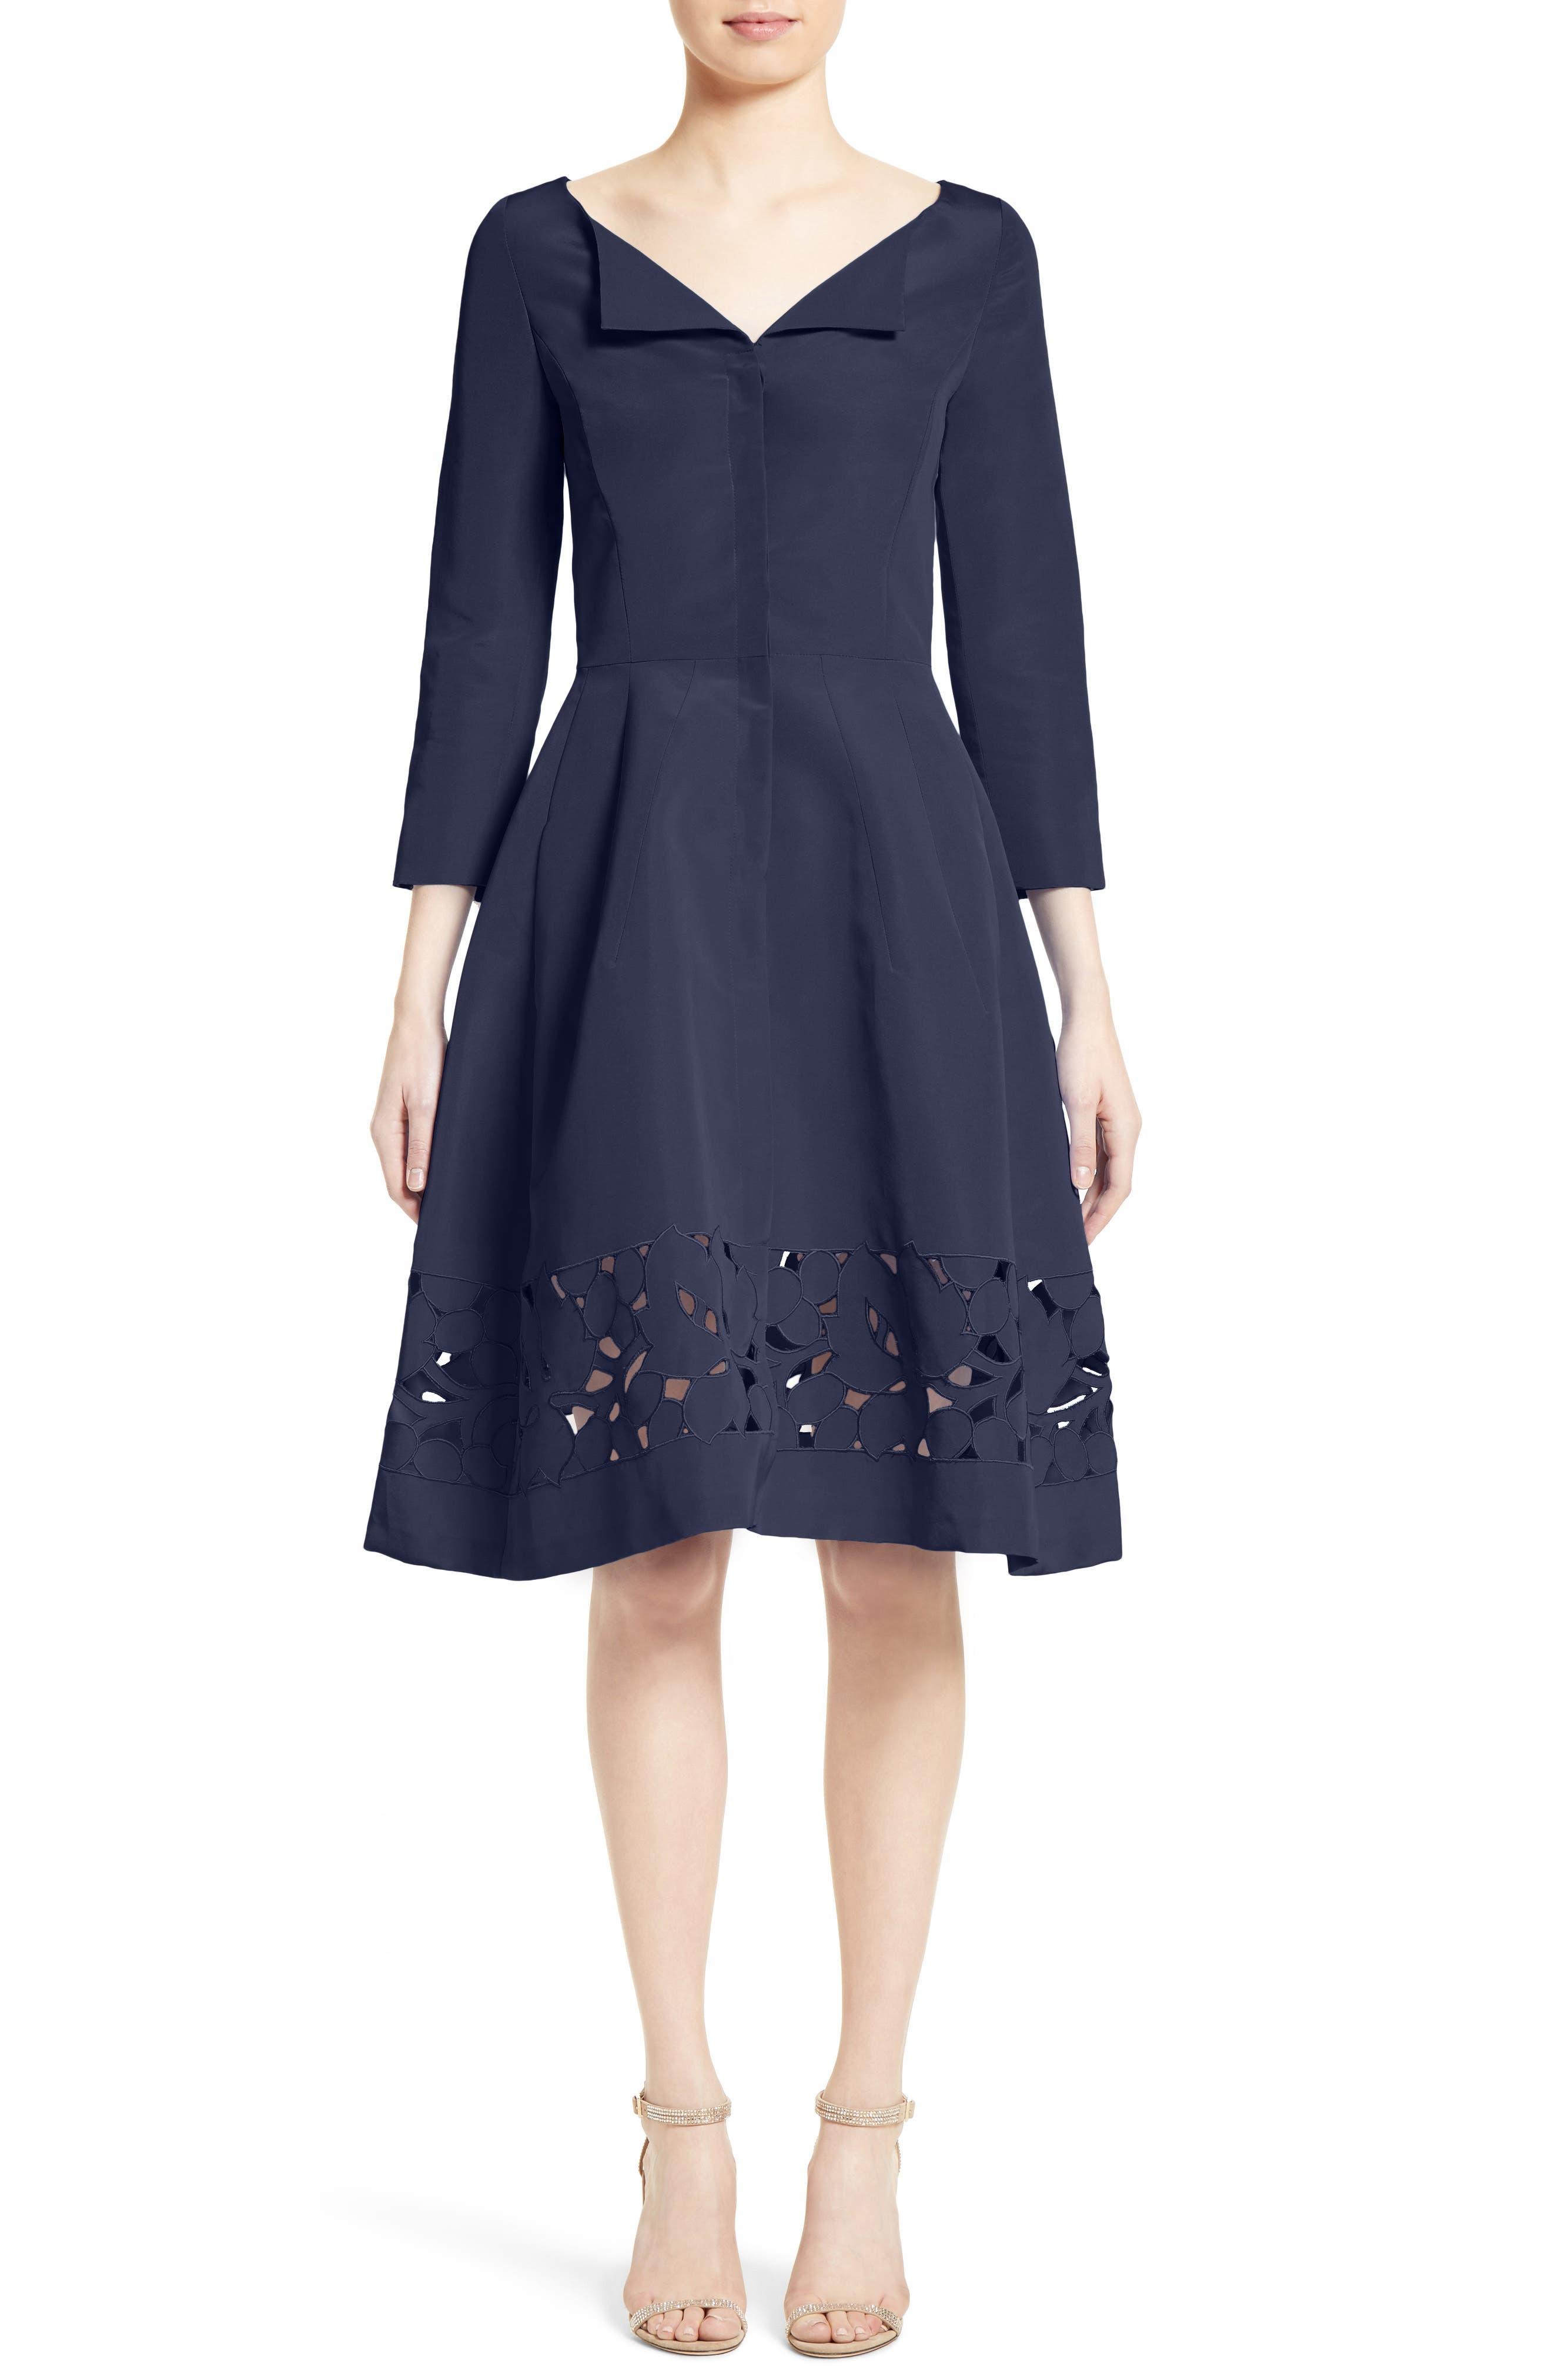 Main Image - Carolina Herrerra Laser Cut Eyelet Button Front Dress